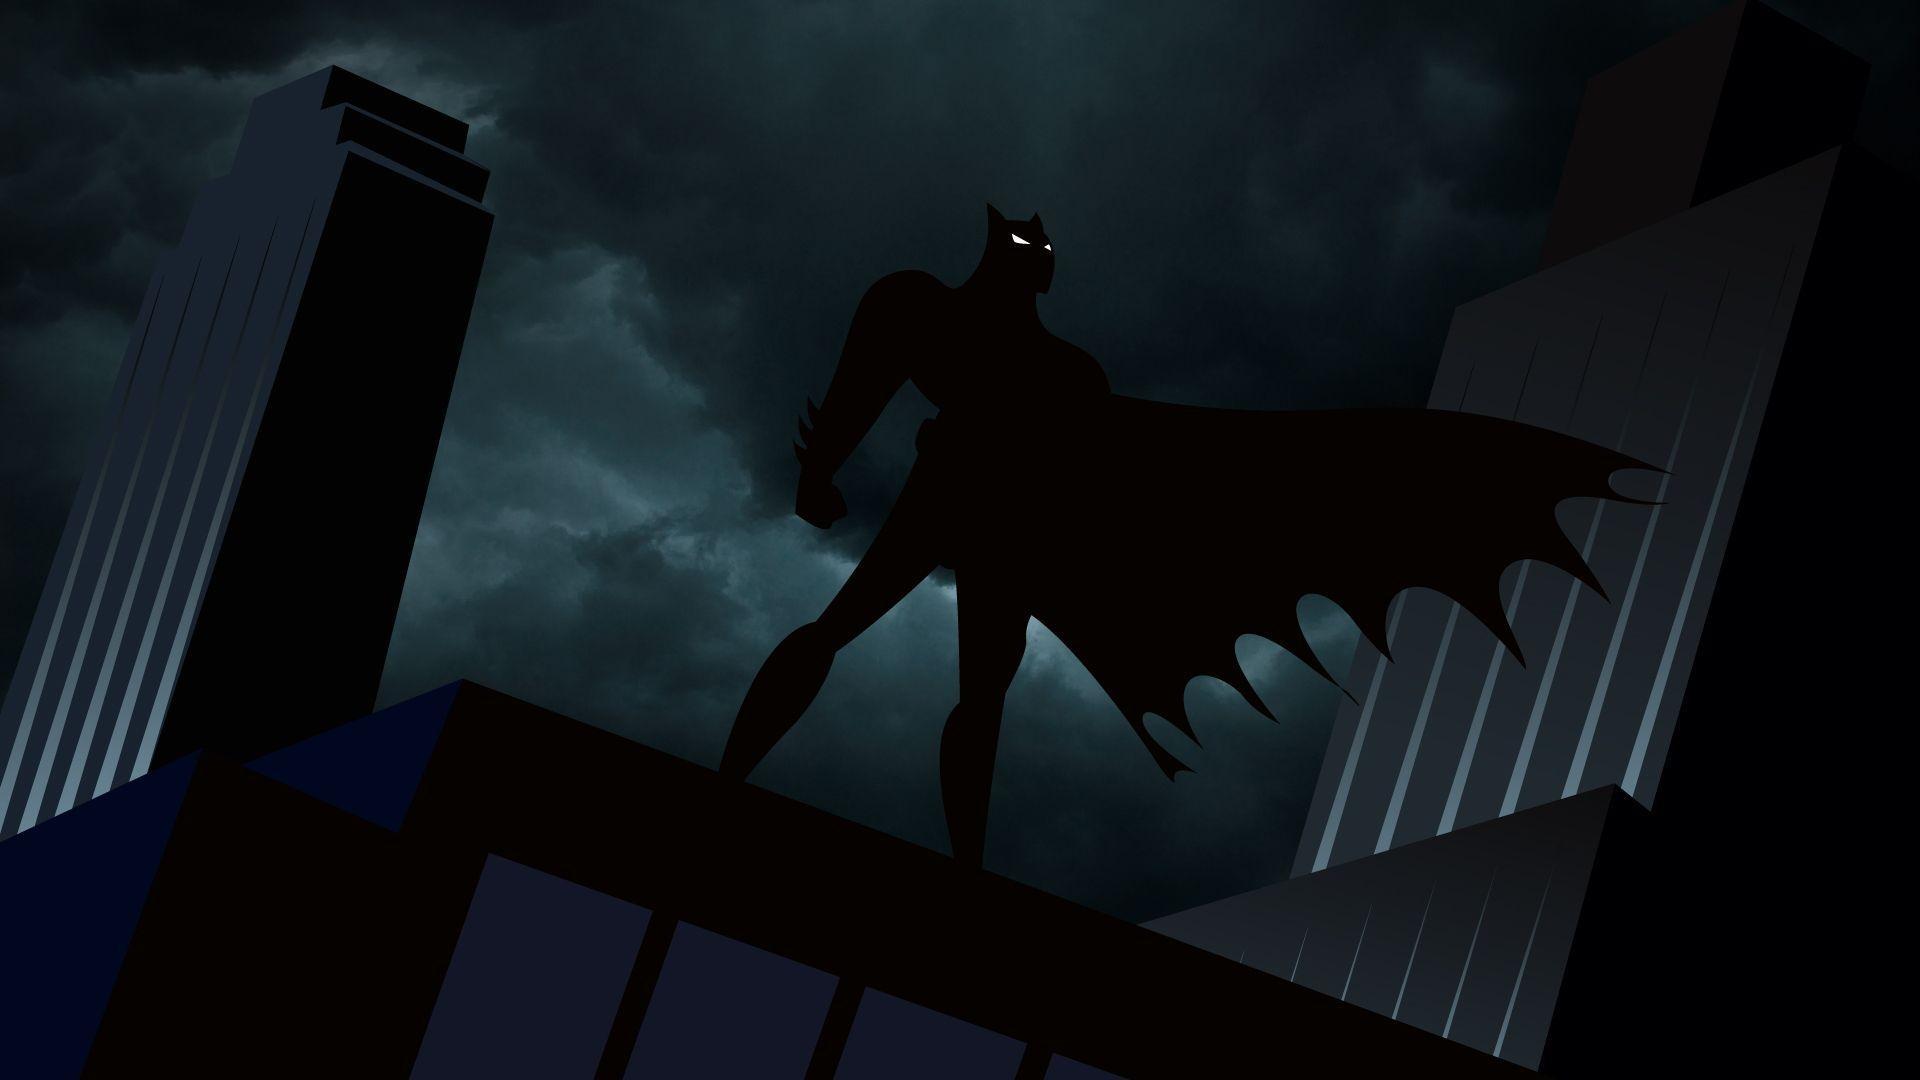 Res: 1920x1080, Batman The Animated Series Gotham wallpaper - 1264582